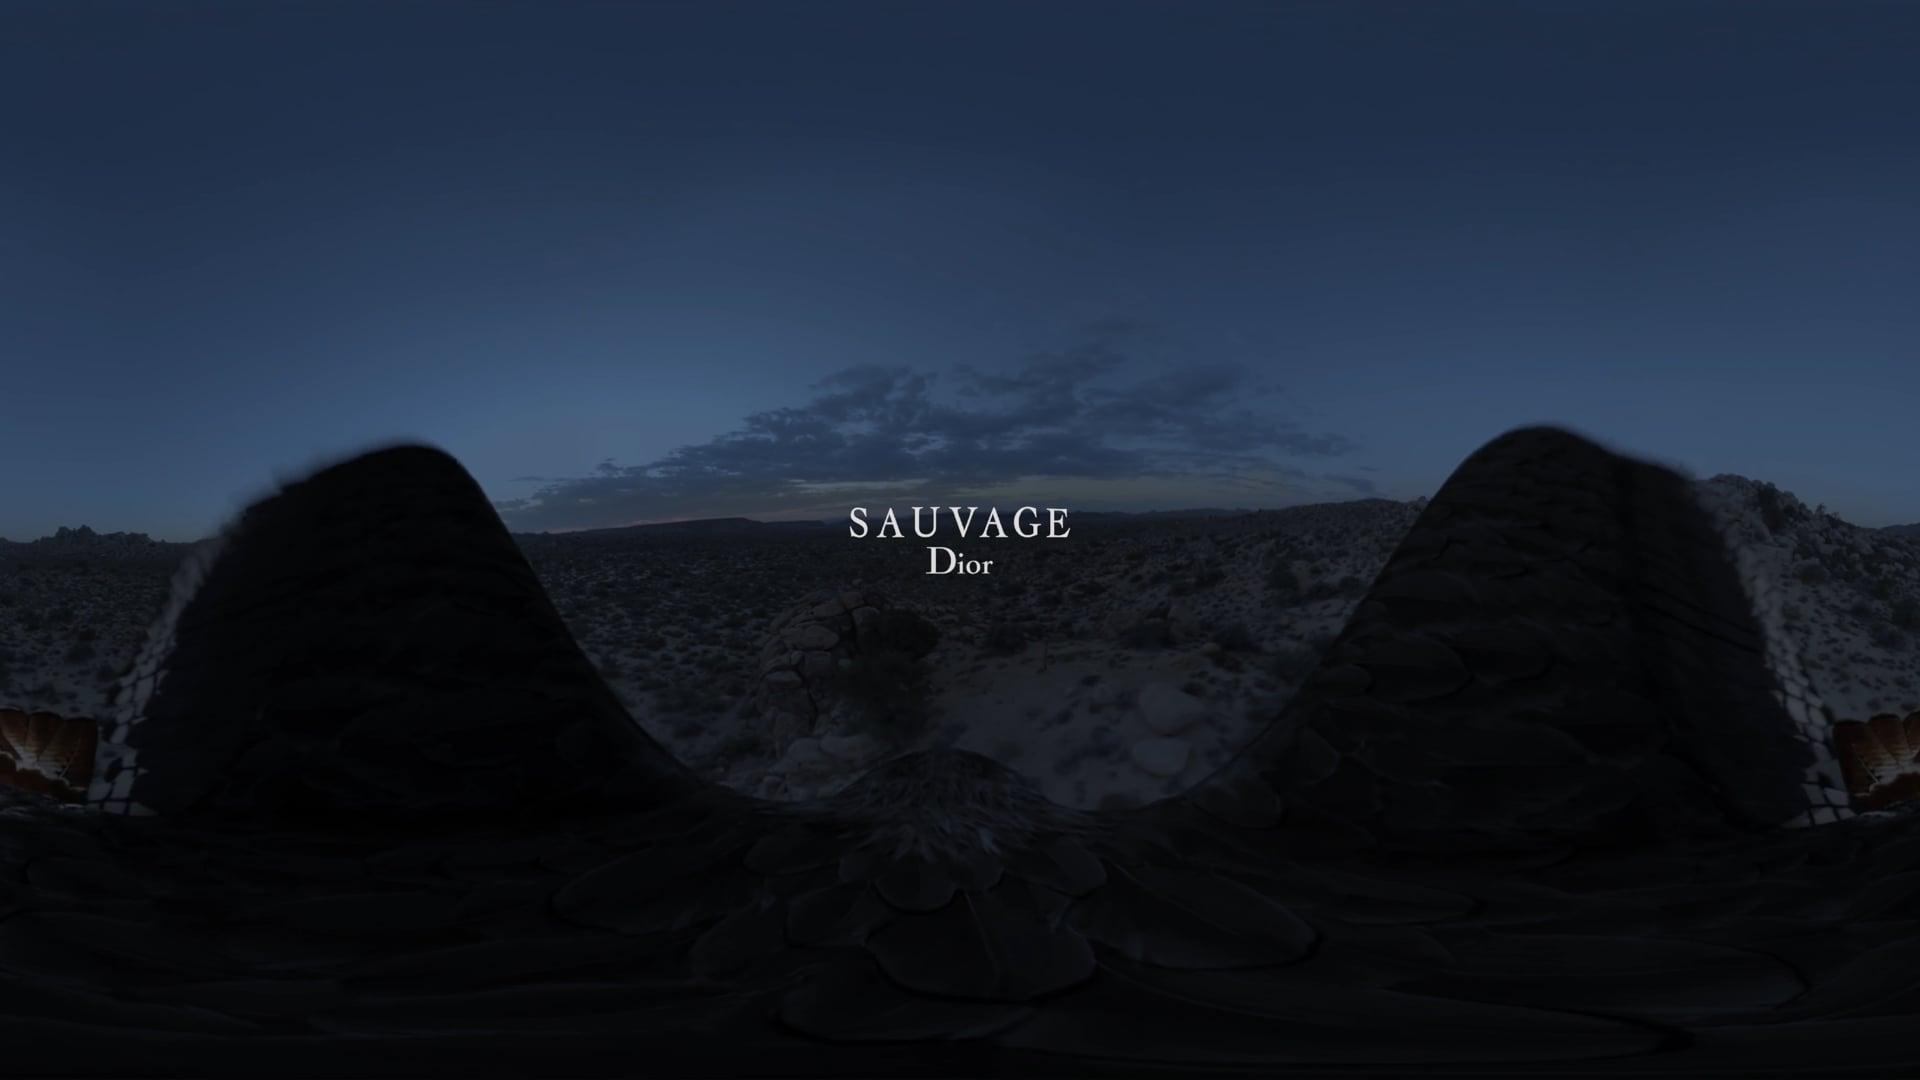 360 VR | Dior Sauvage